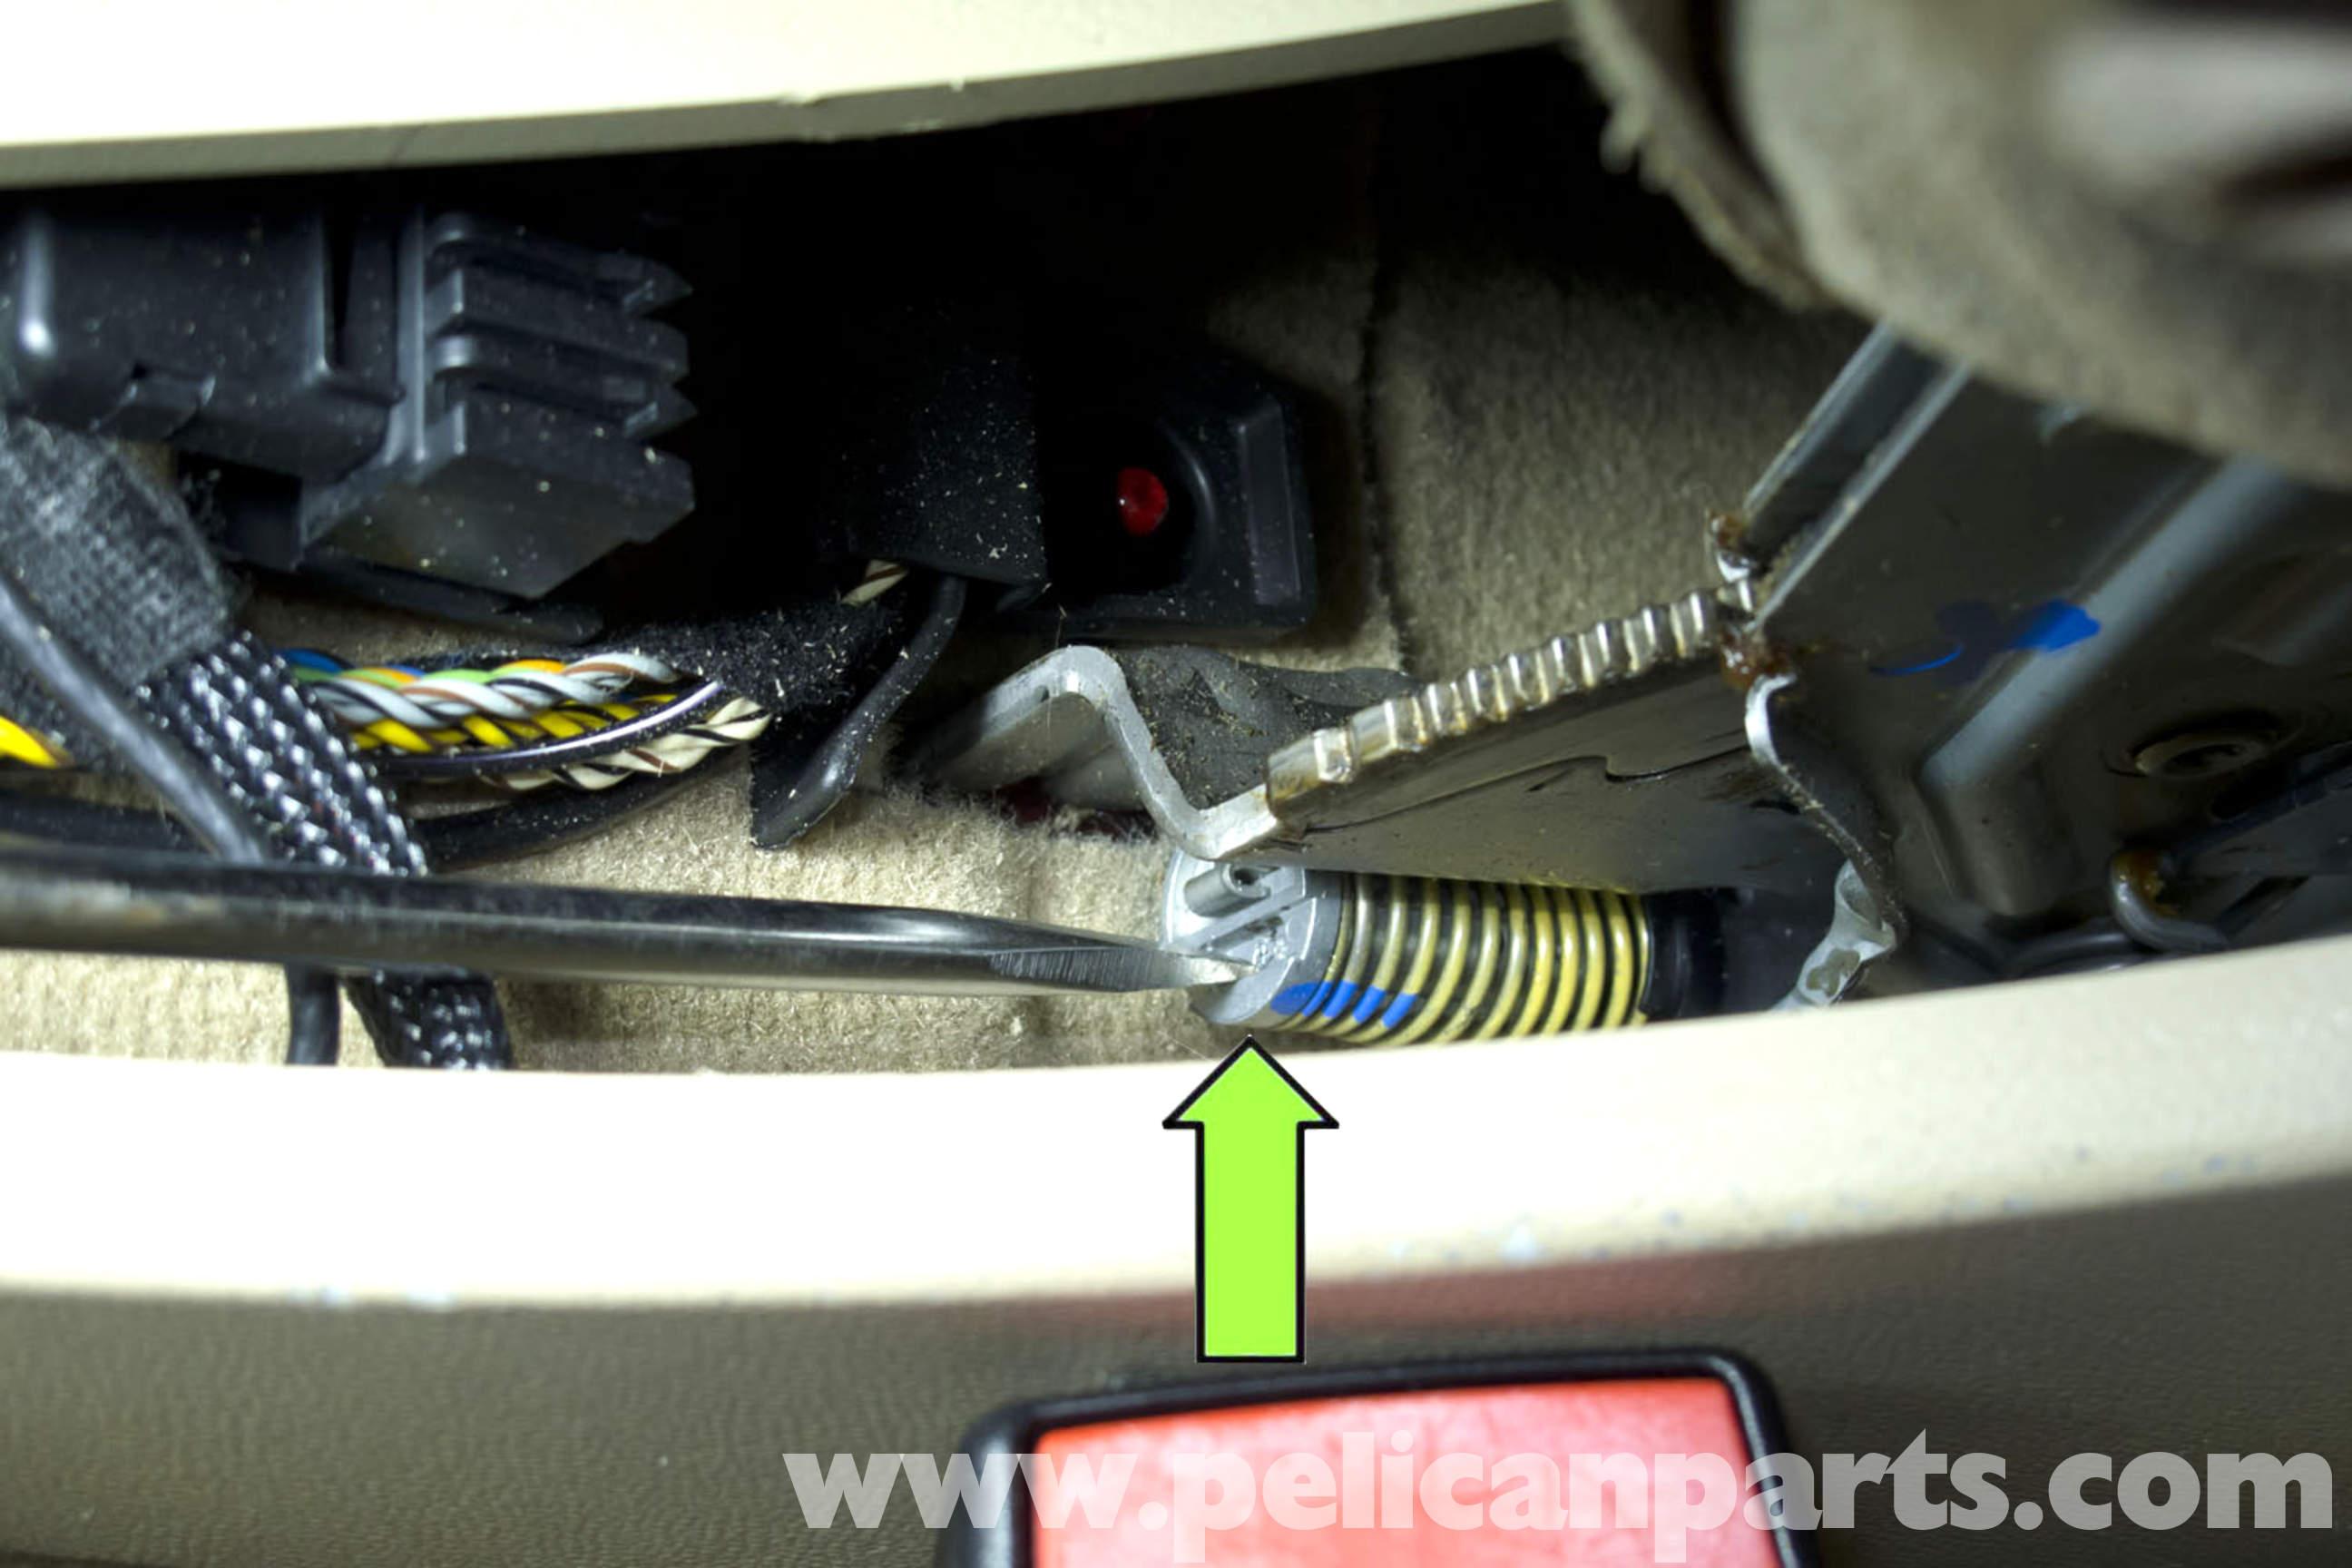 BMW E90 Parking Brake Shoes Replacement  E91 E92 E93  Pelican